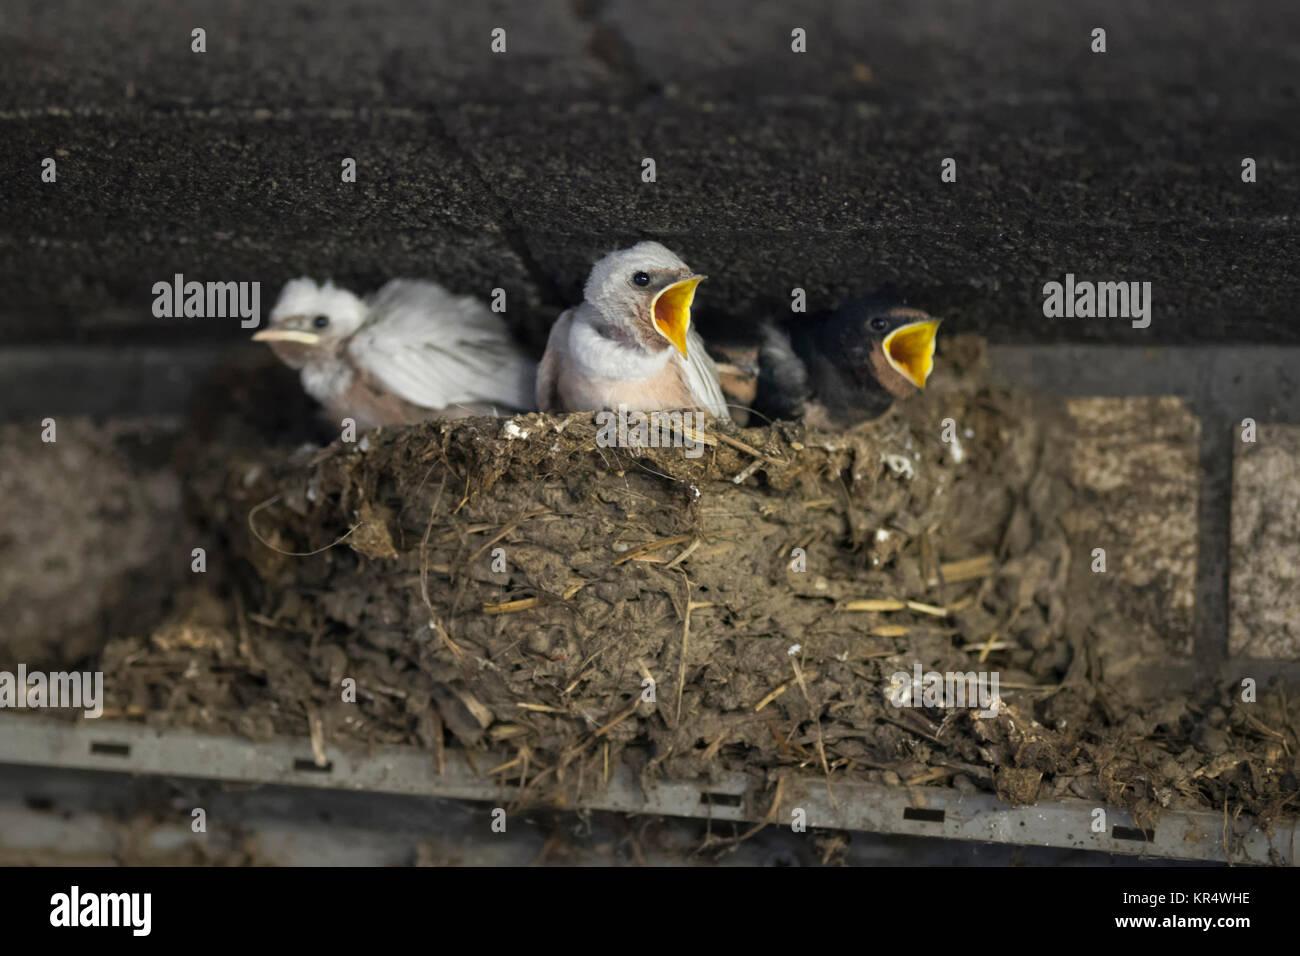 Barn Swallow / Swallows ( Hirundo rustica ), leucistic chicks in nest, white plumage, rare pigment defect, leucism, - Stock Image